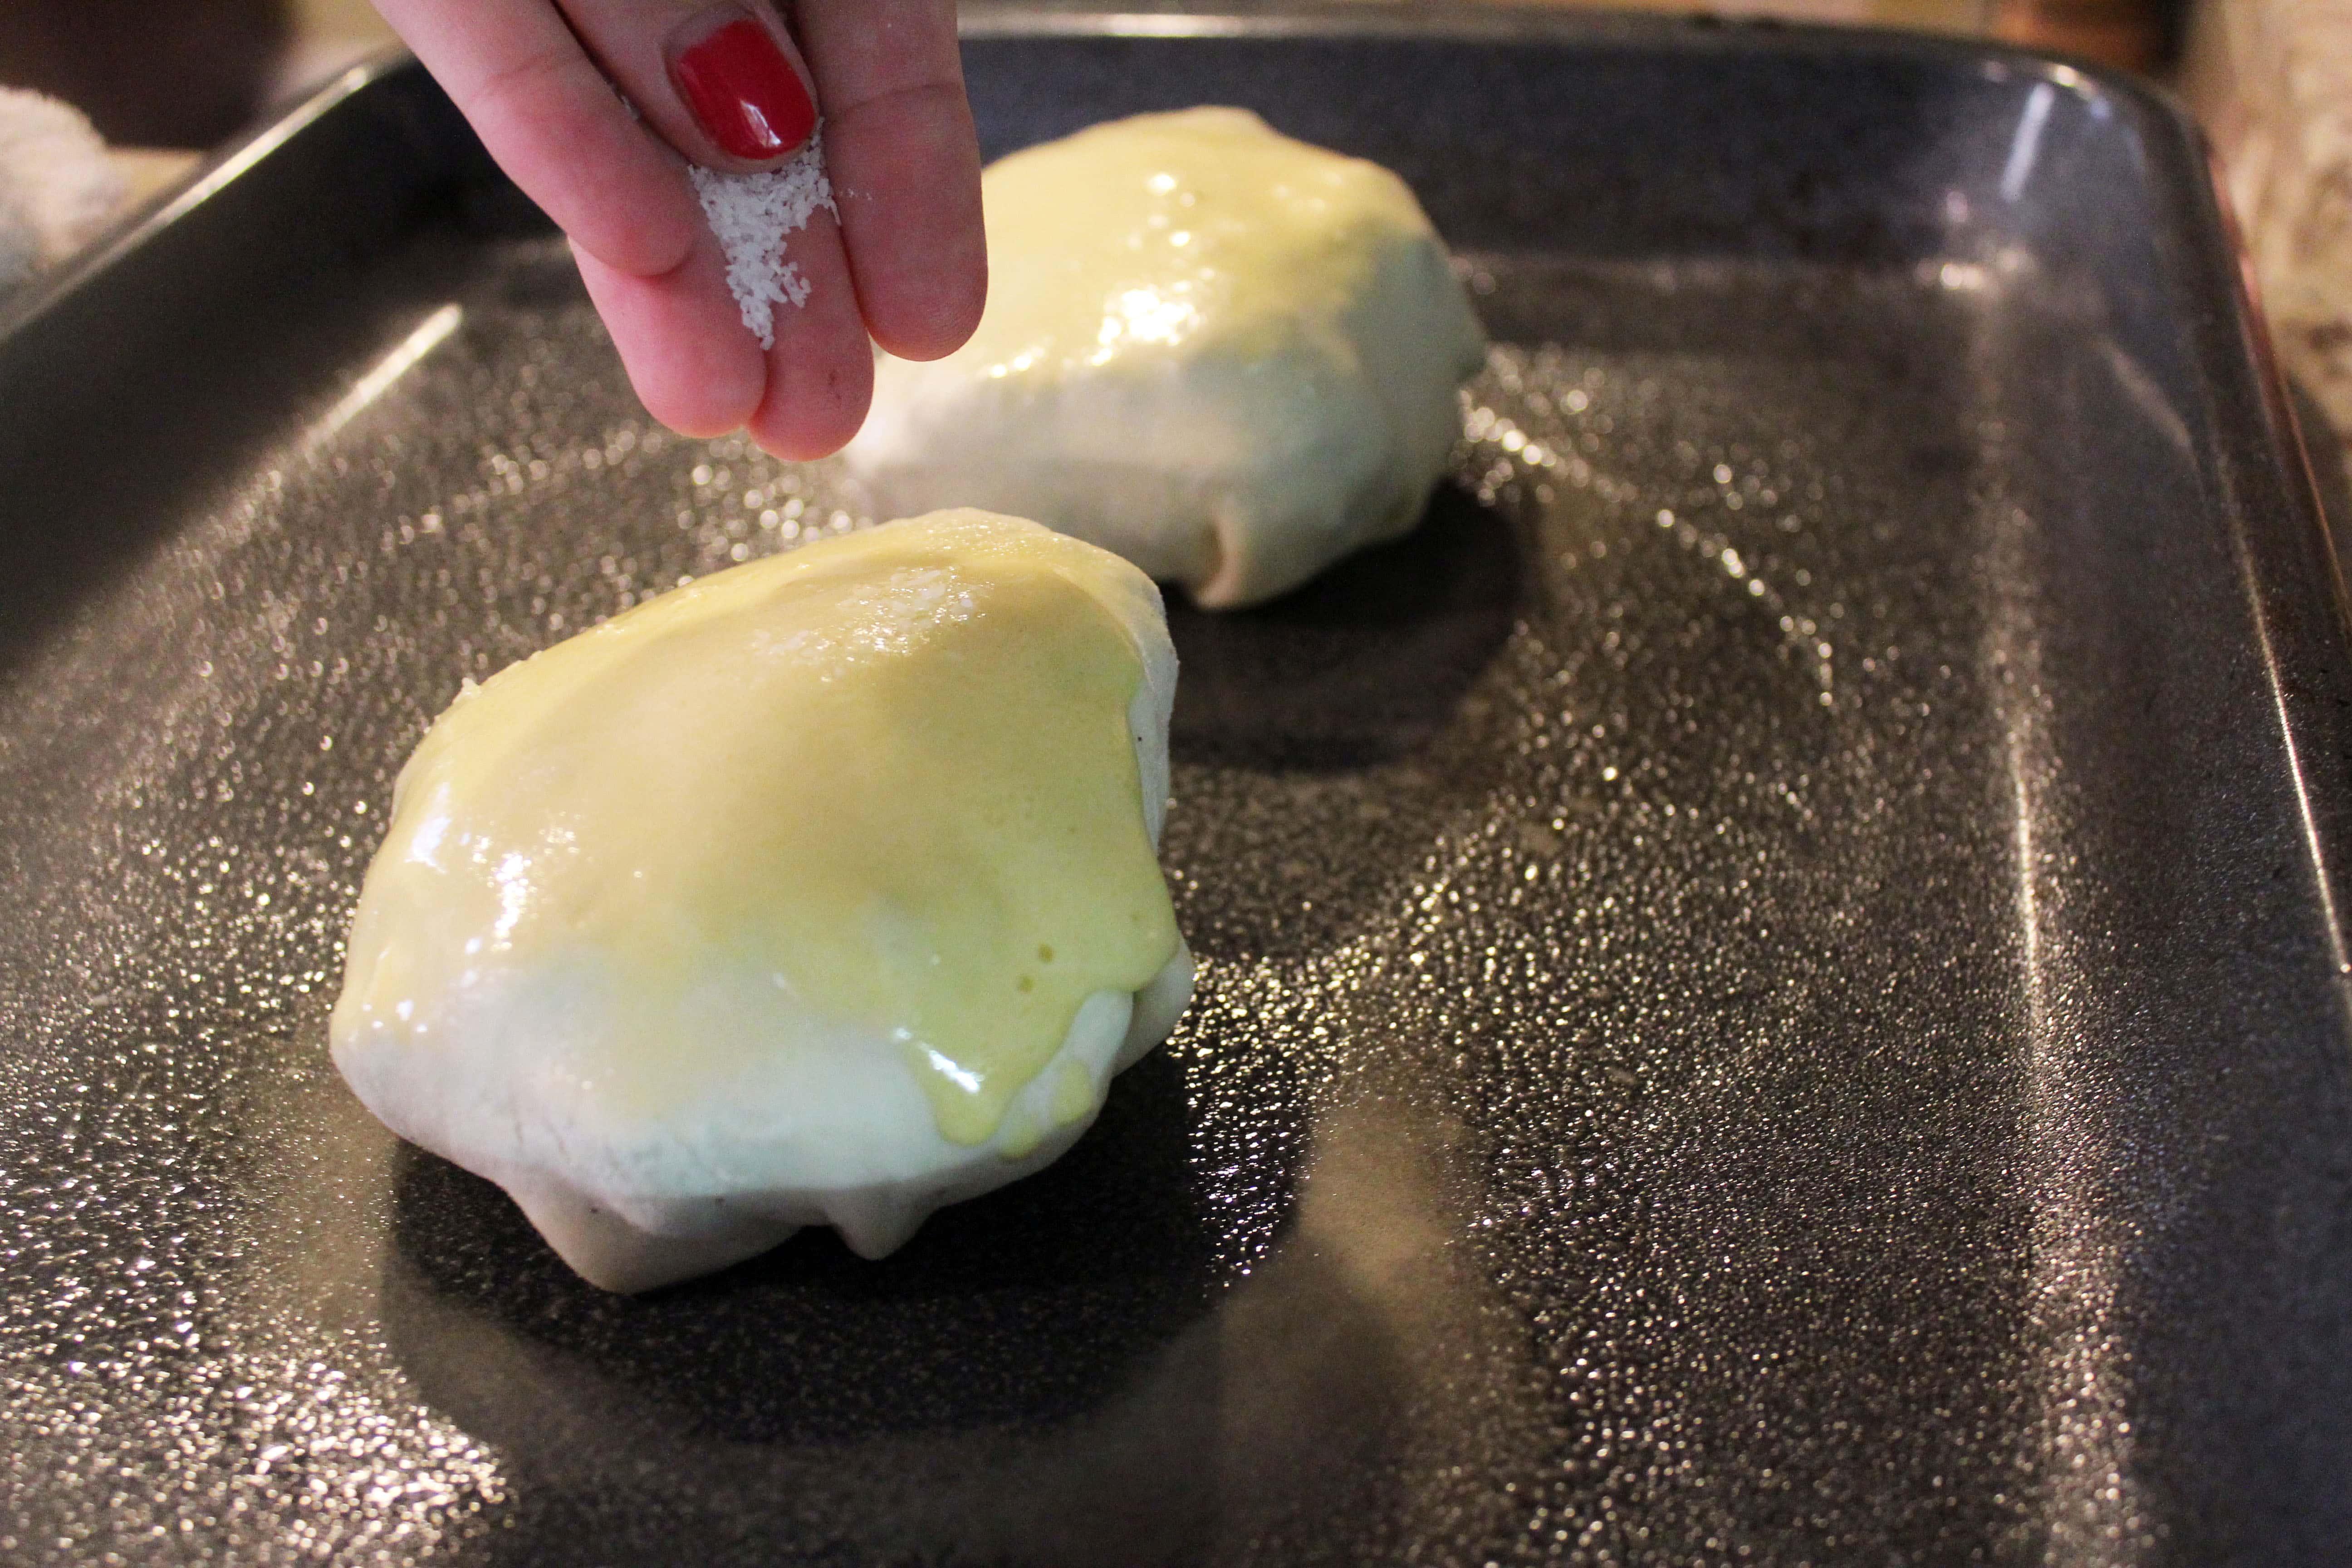 Sprinkle on salt before baking